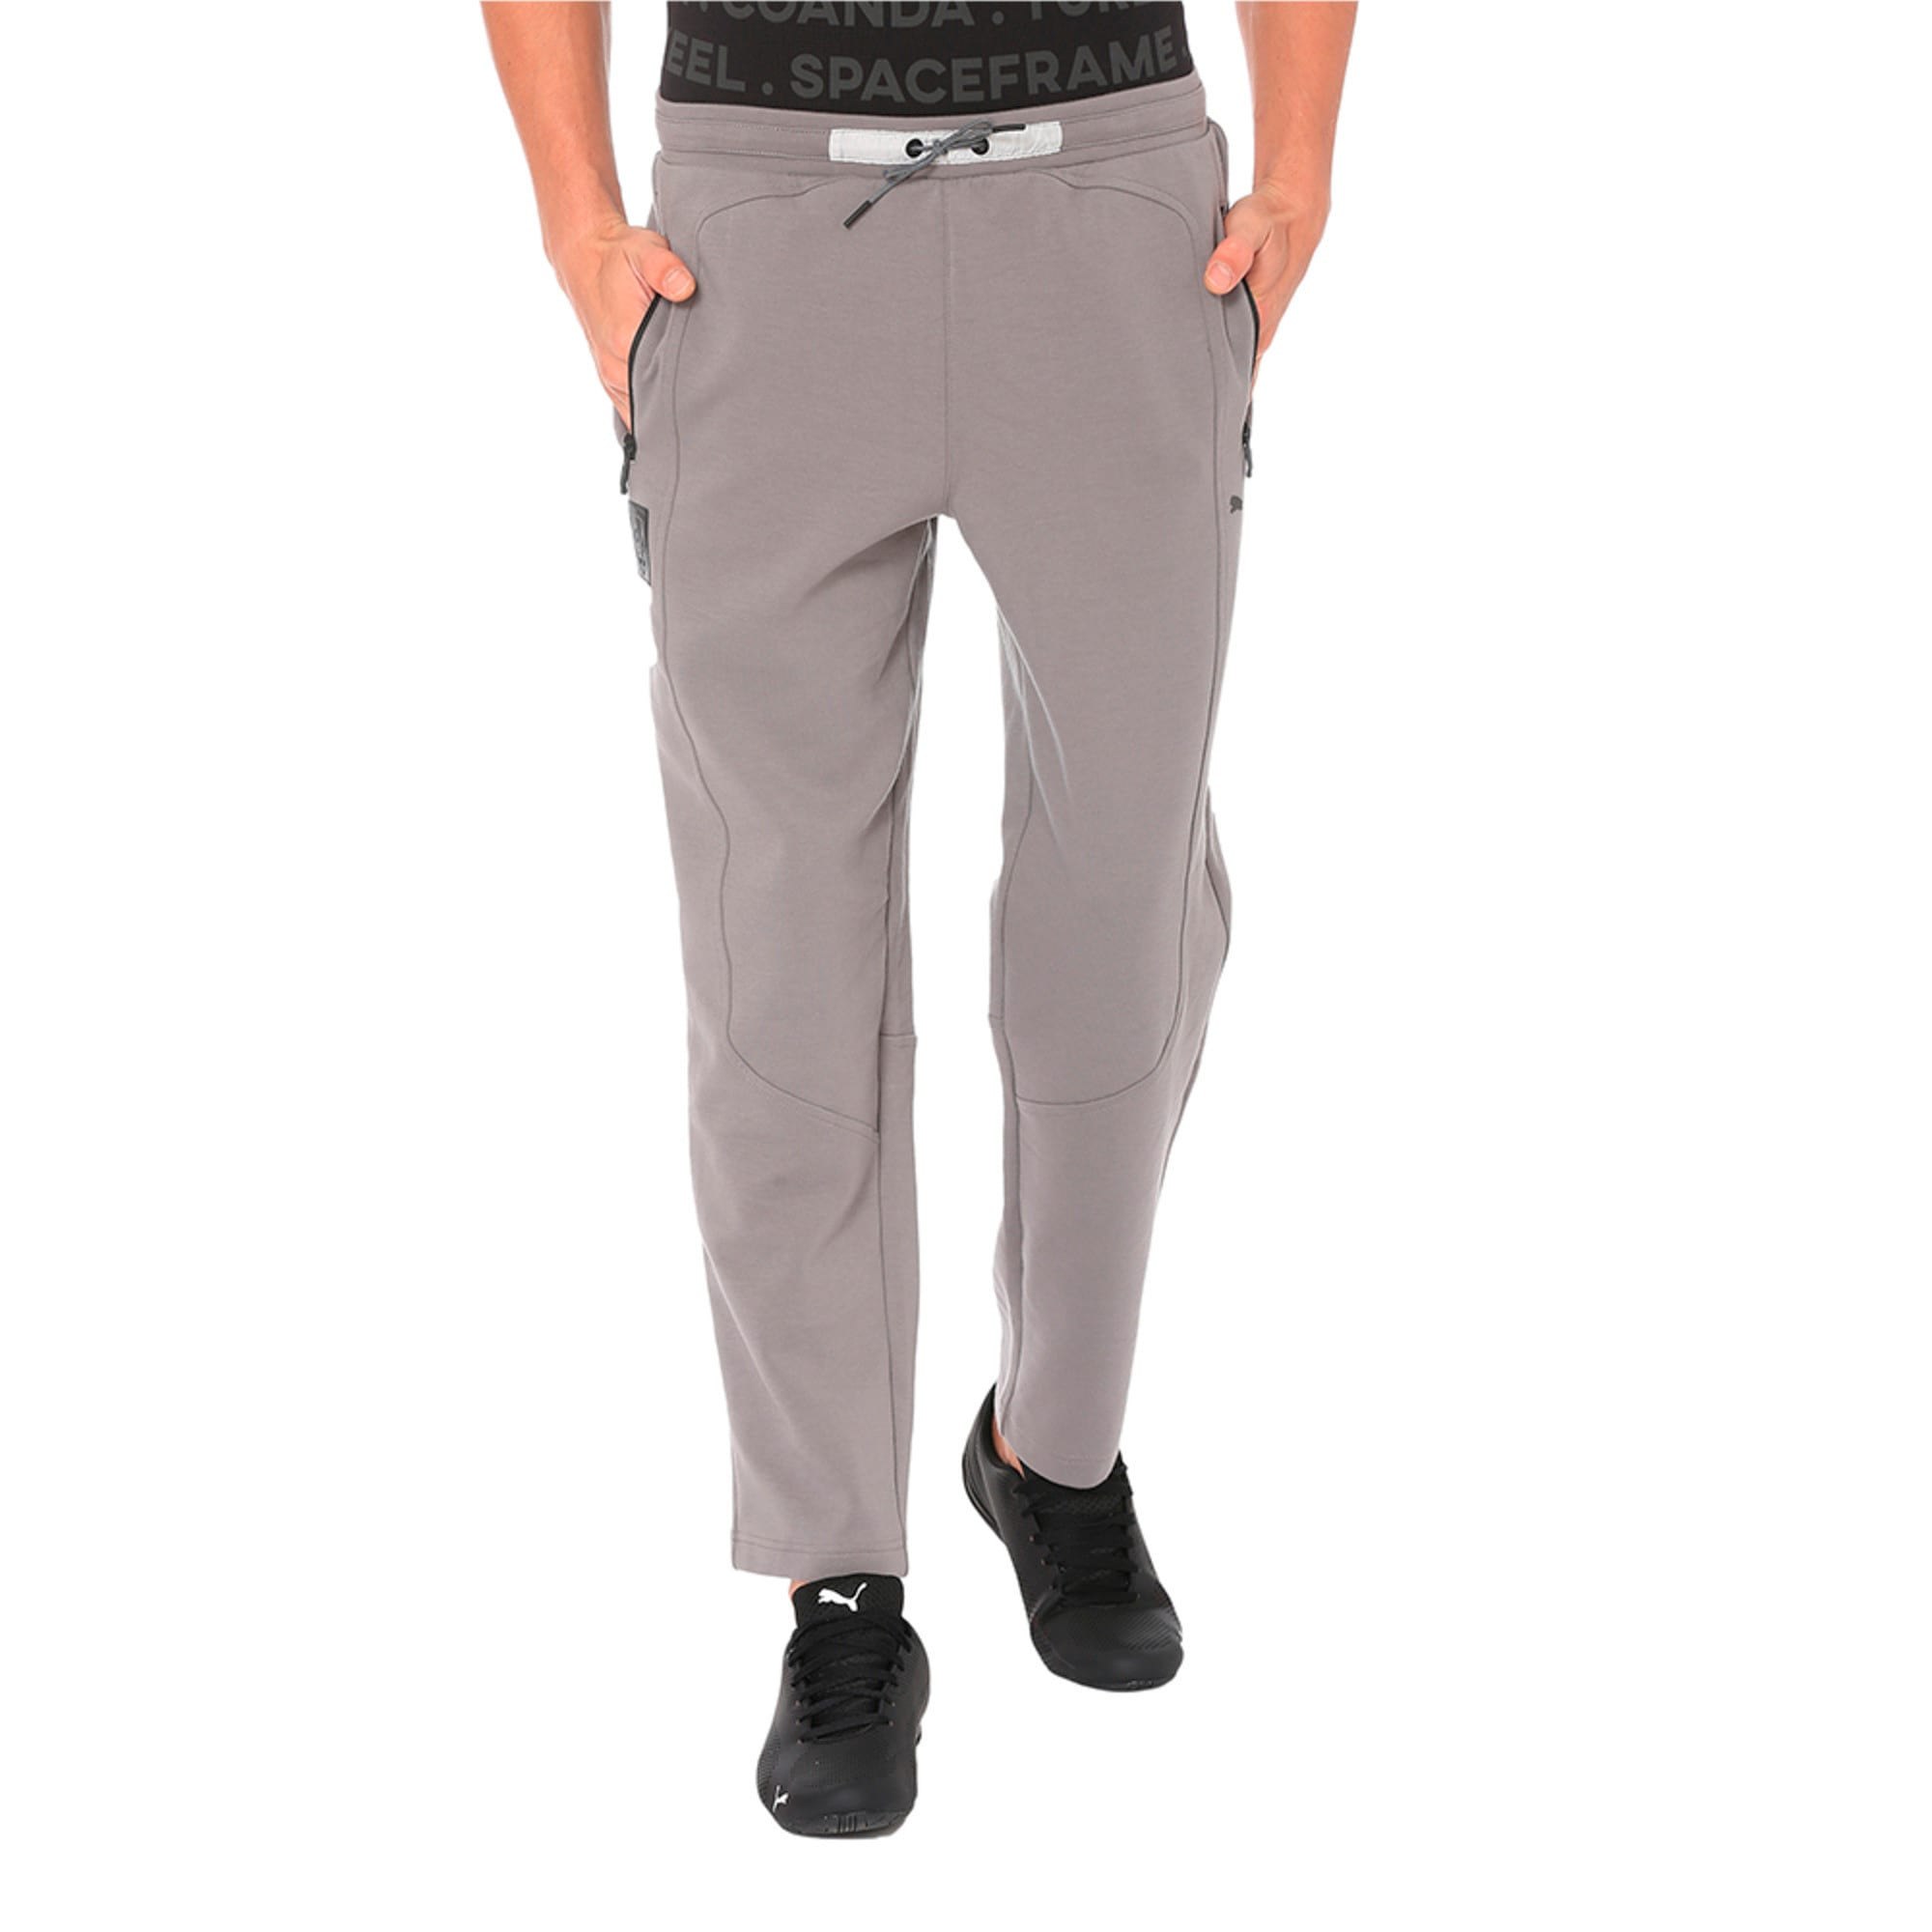 Thumbnail 1 of Ferrari OC Men's Sweat Pants, Charcoal Gray, medium-IND